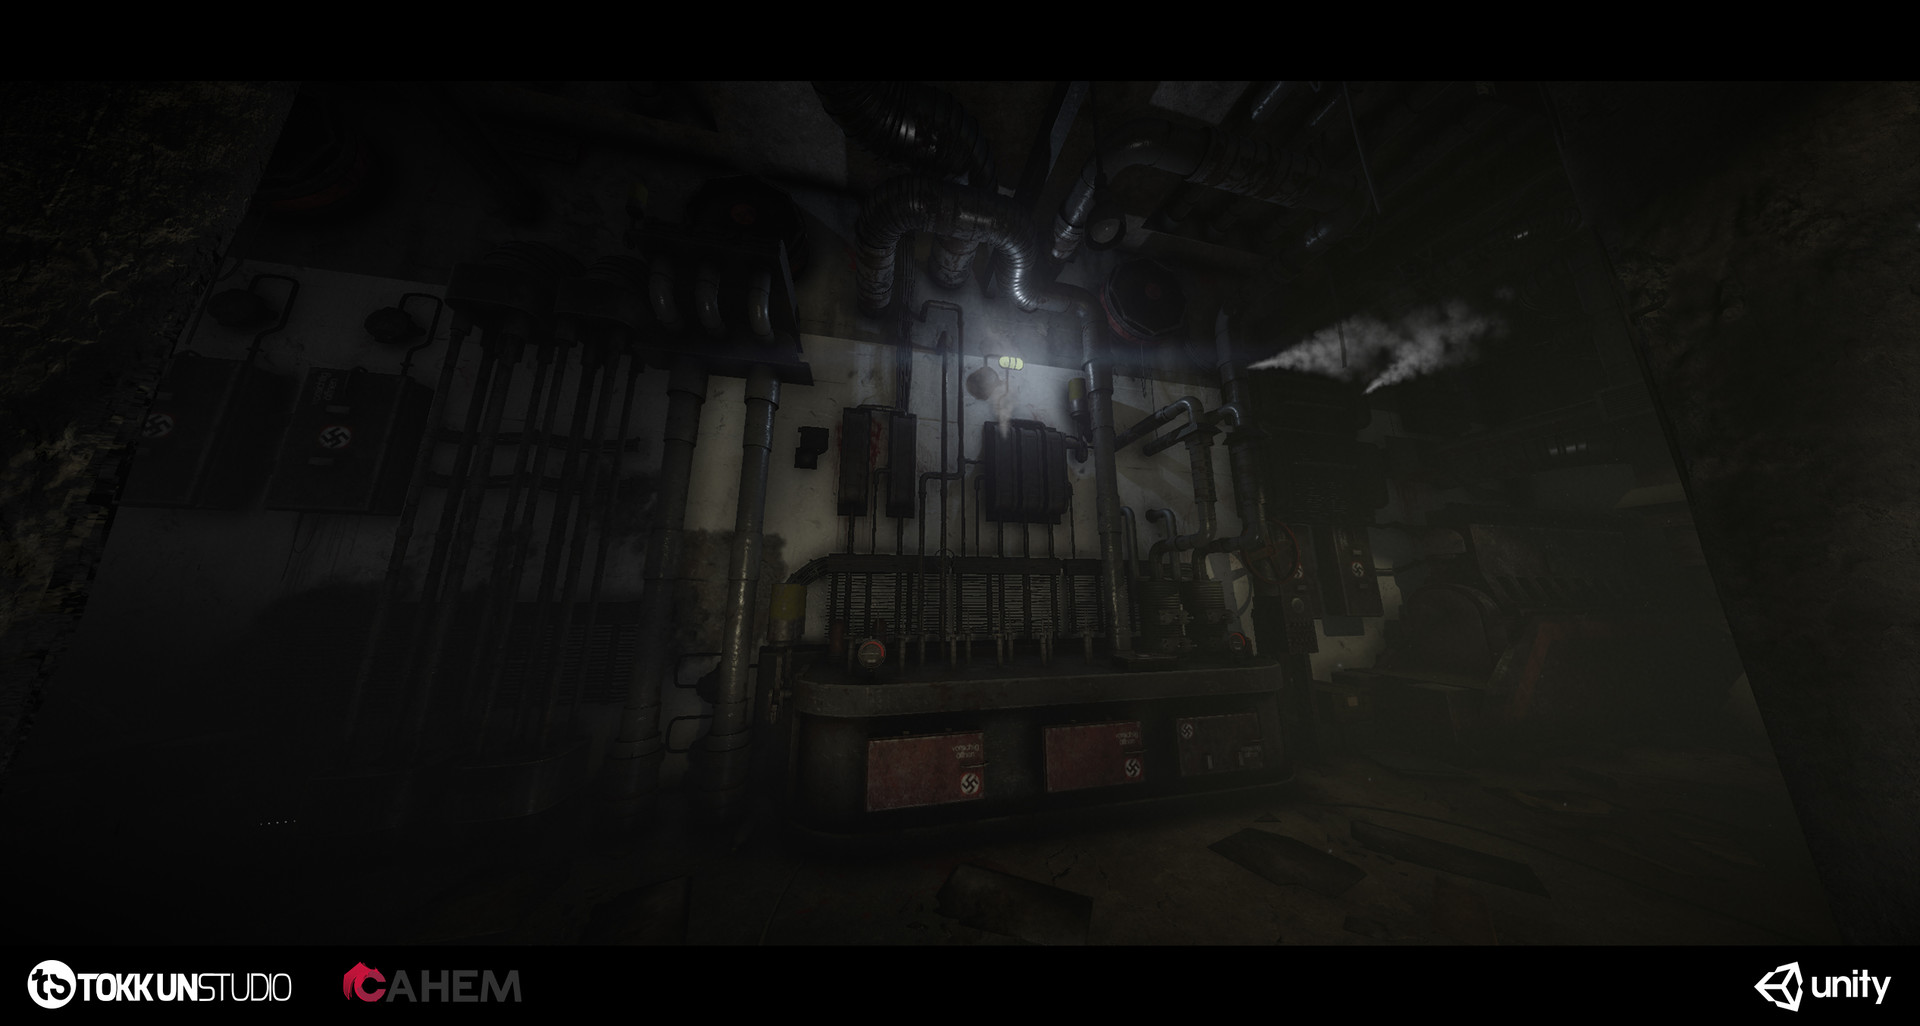 Tokkun studio bunker shot 21